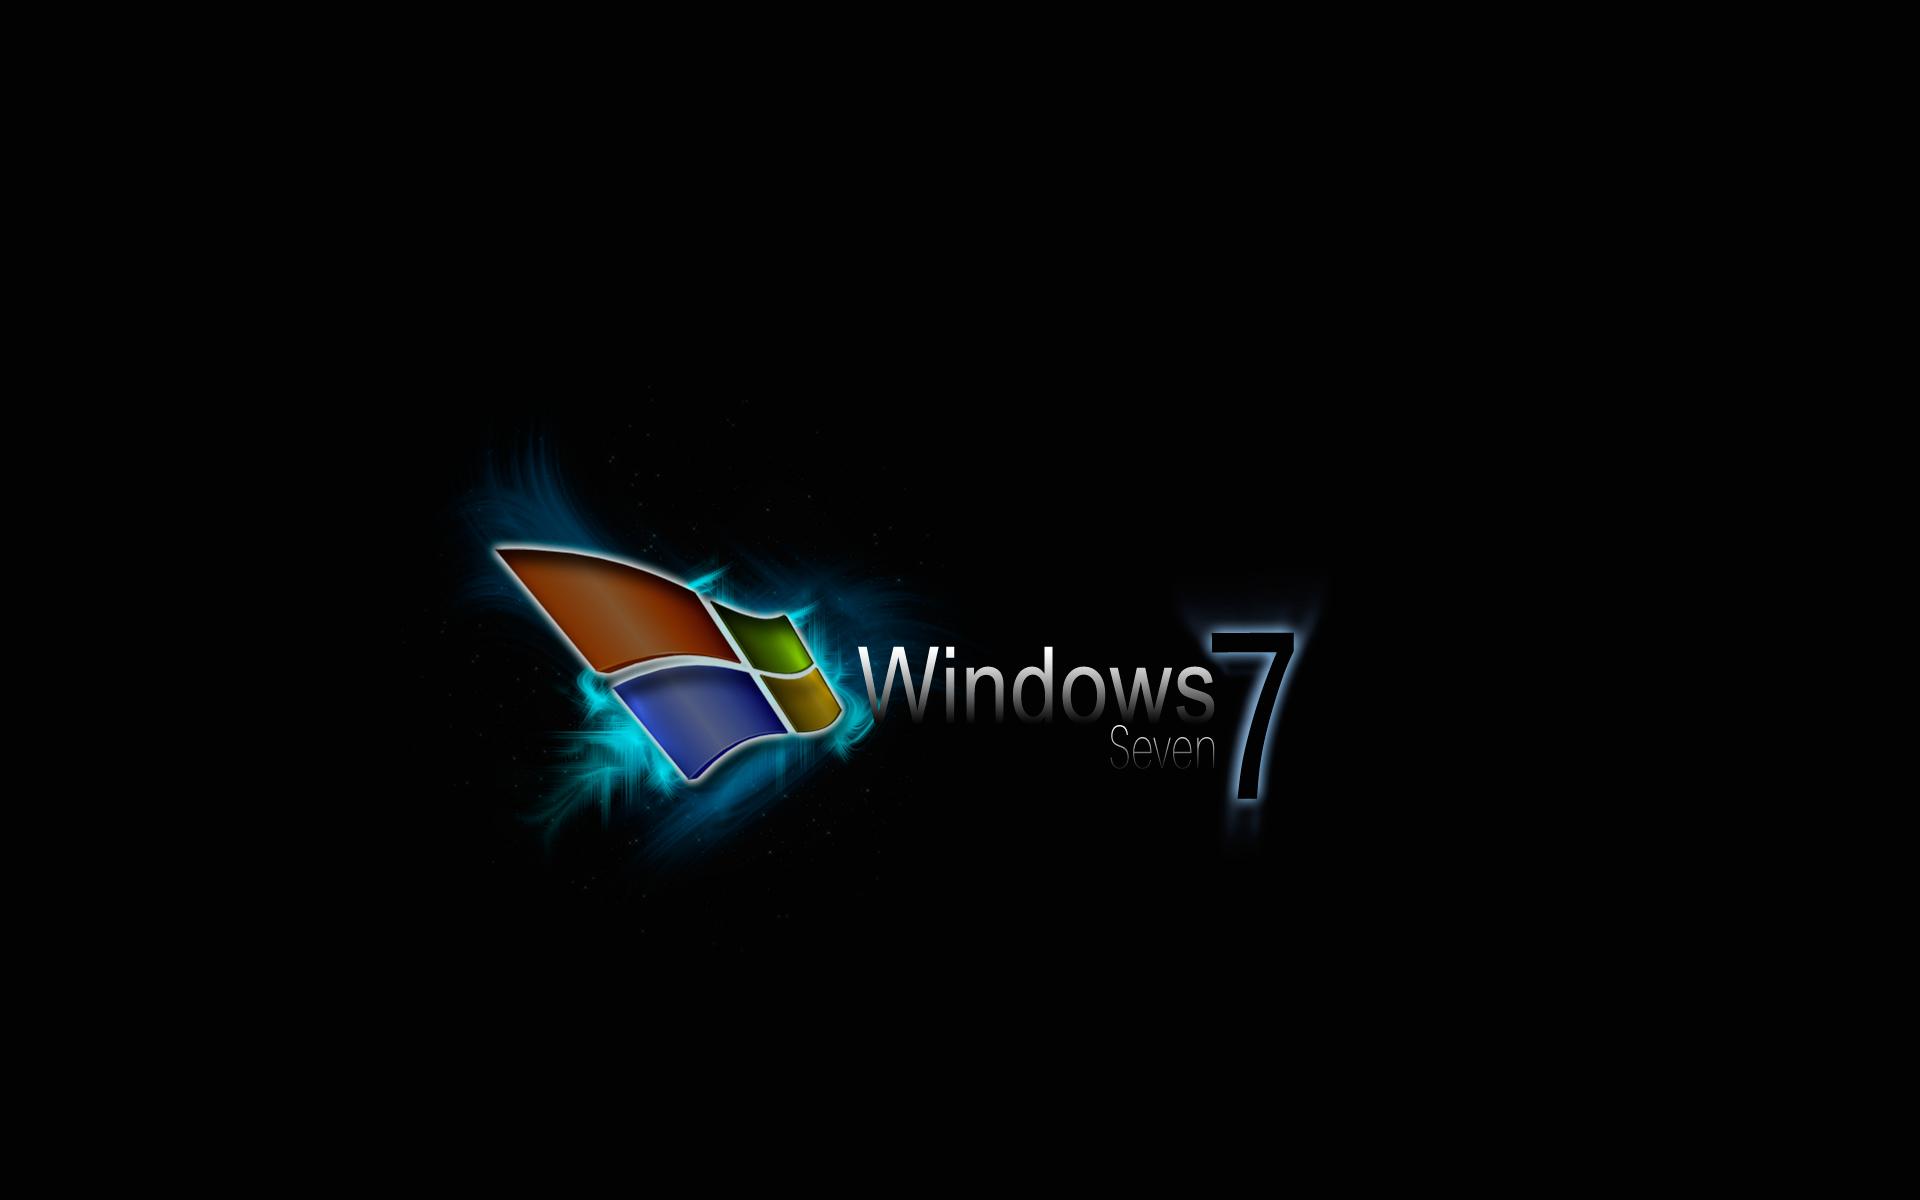 Unduh 700 Wallpaper Bergerak Windows 7 Ultimate HD Terbaik